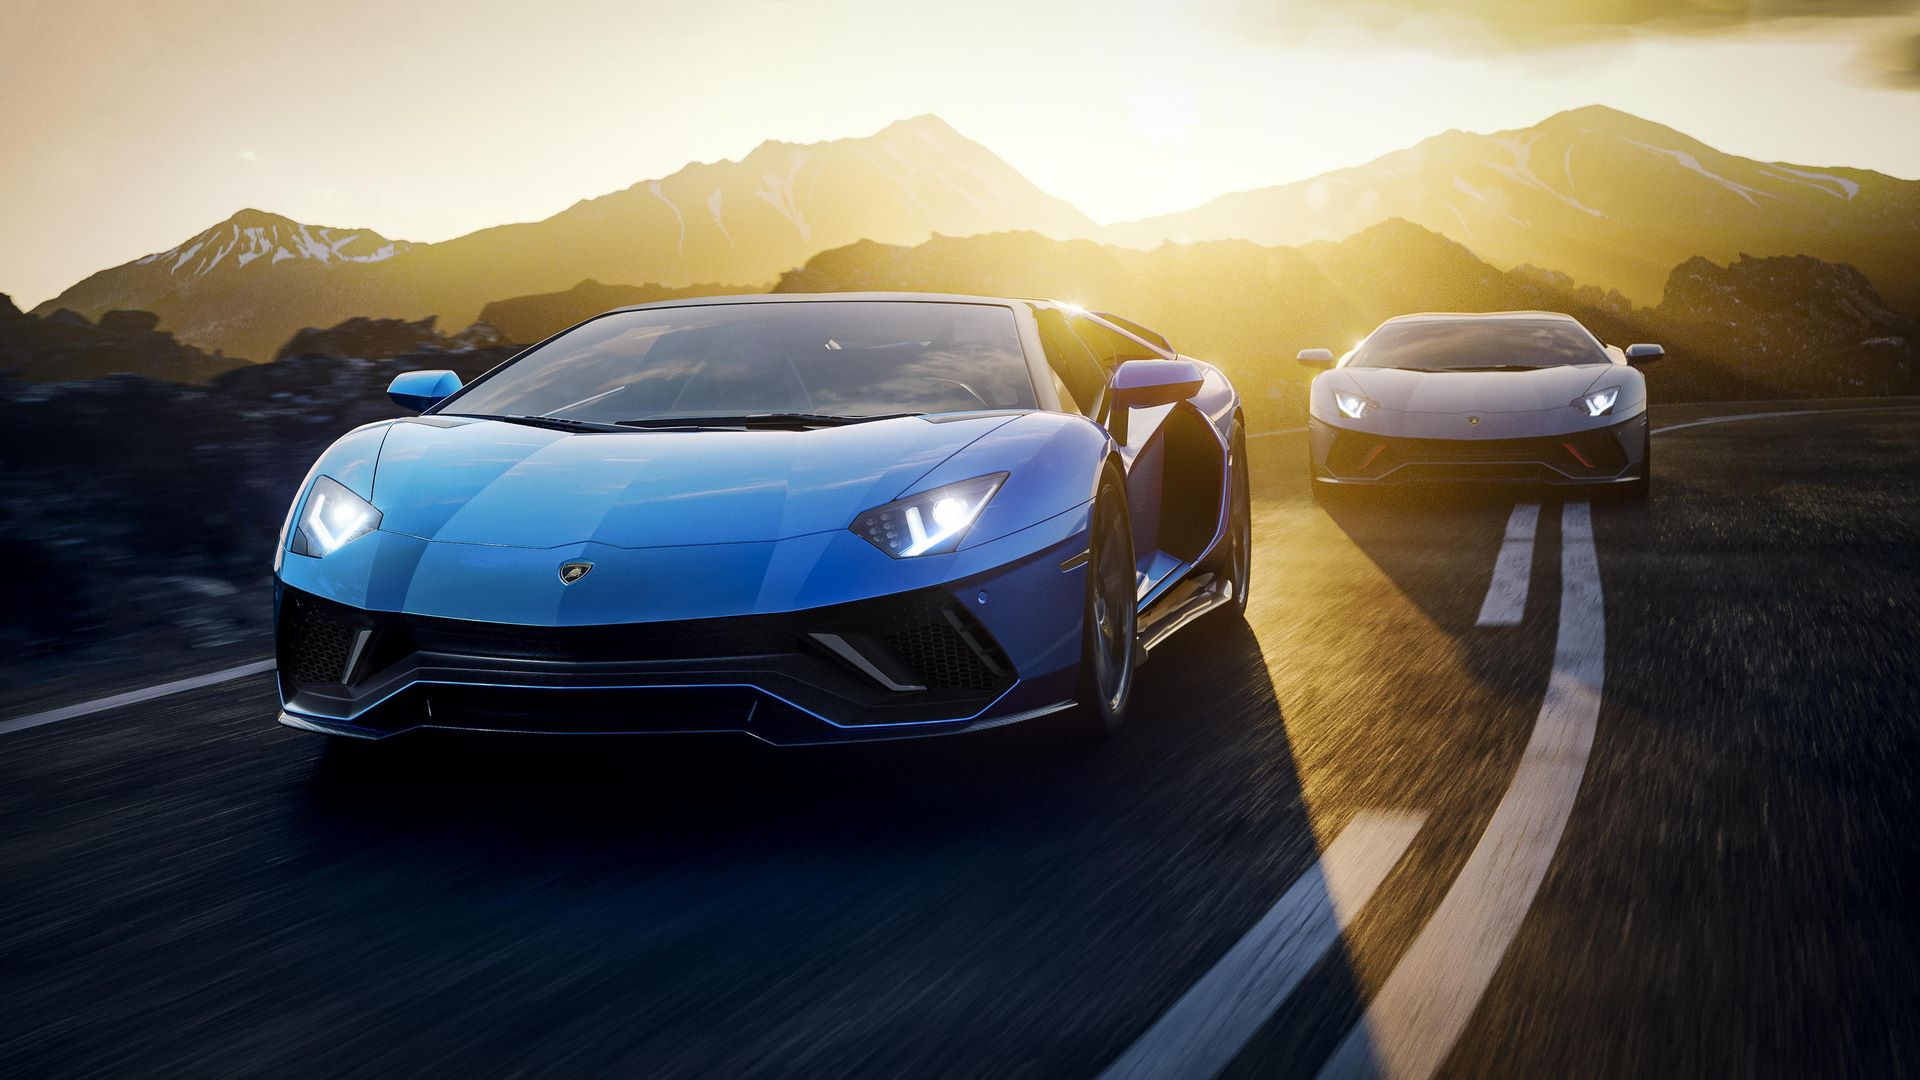 Lamborghini-Aventador-LP780-4-Ultimae-1